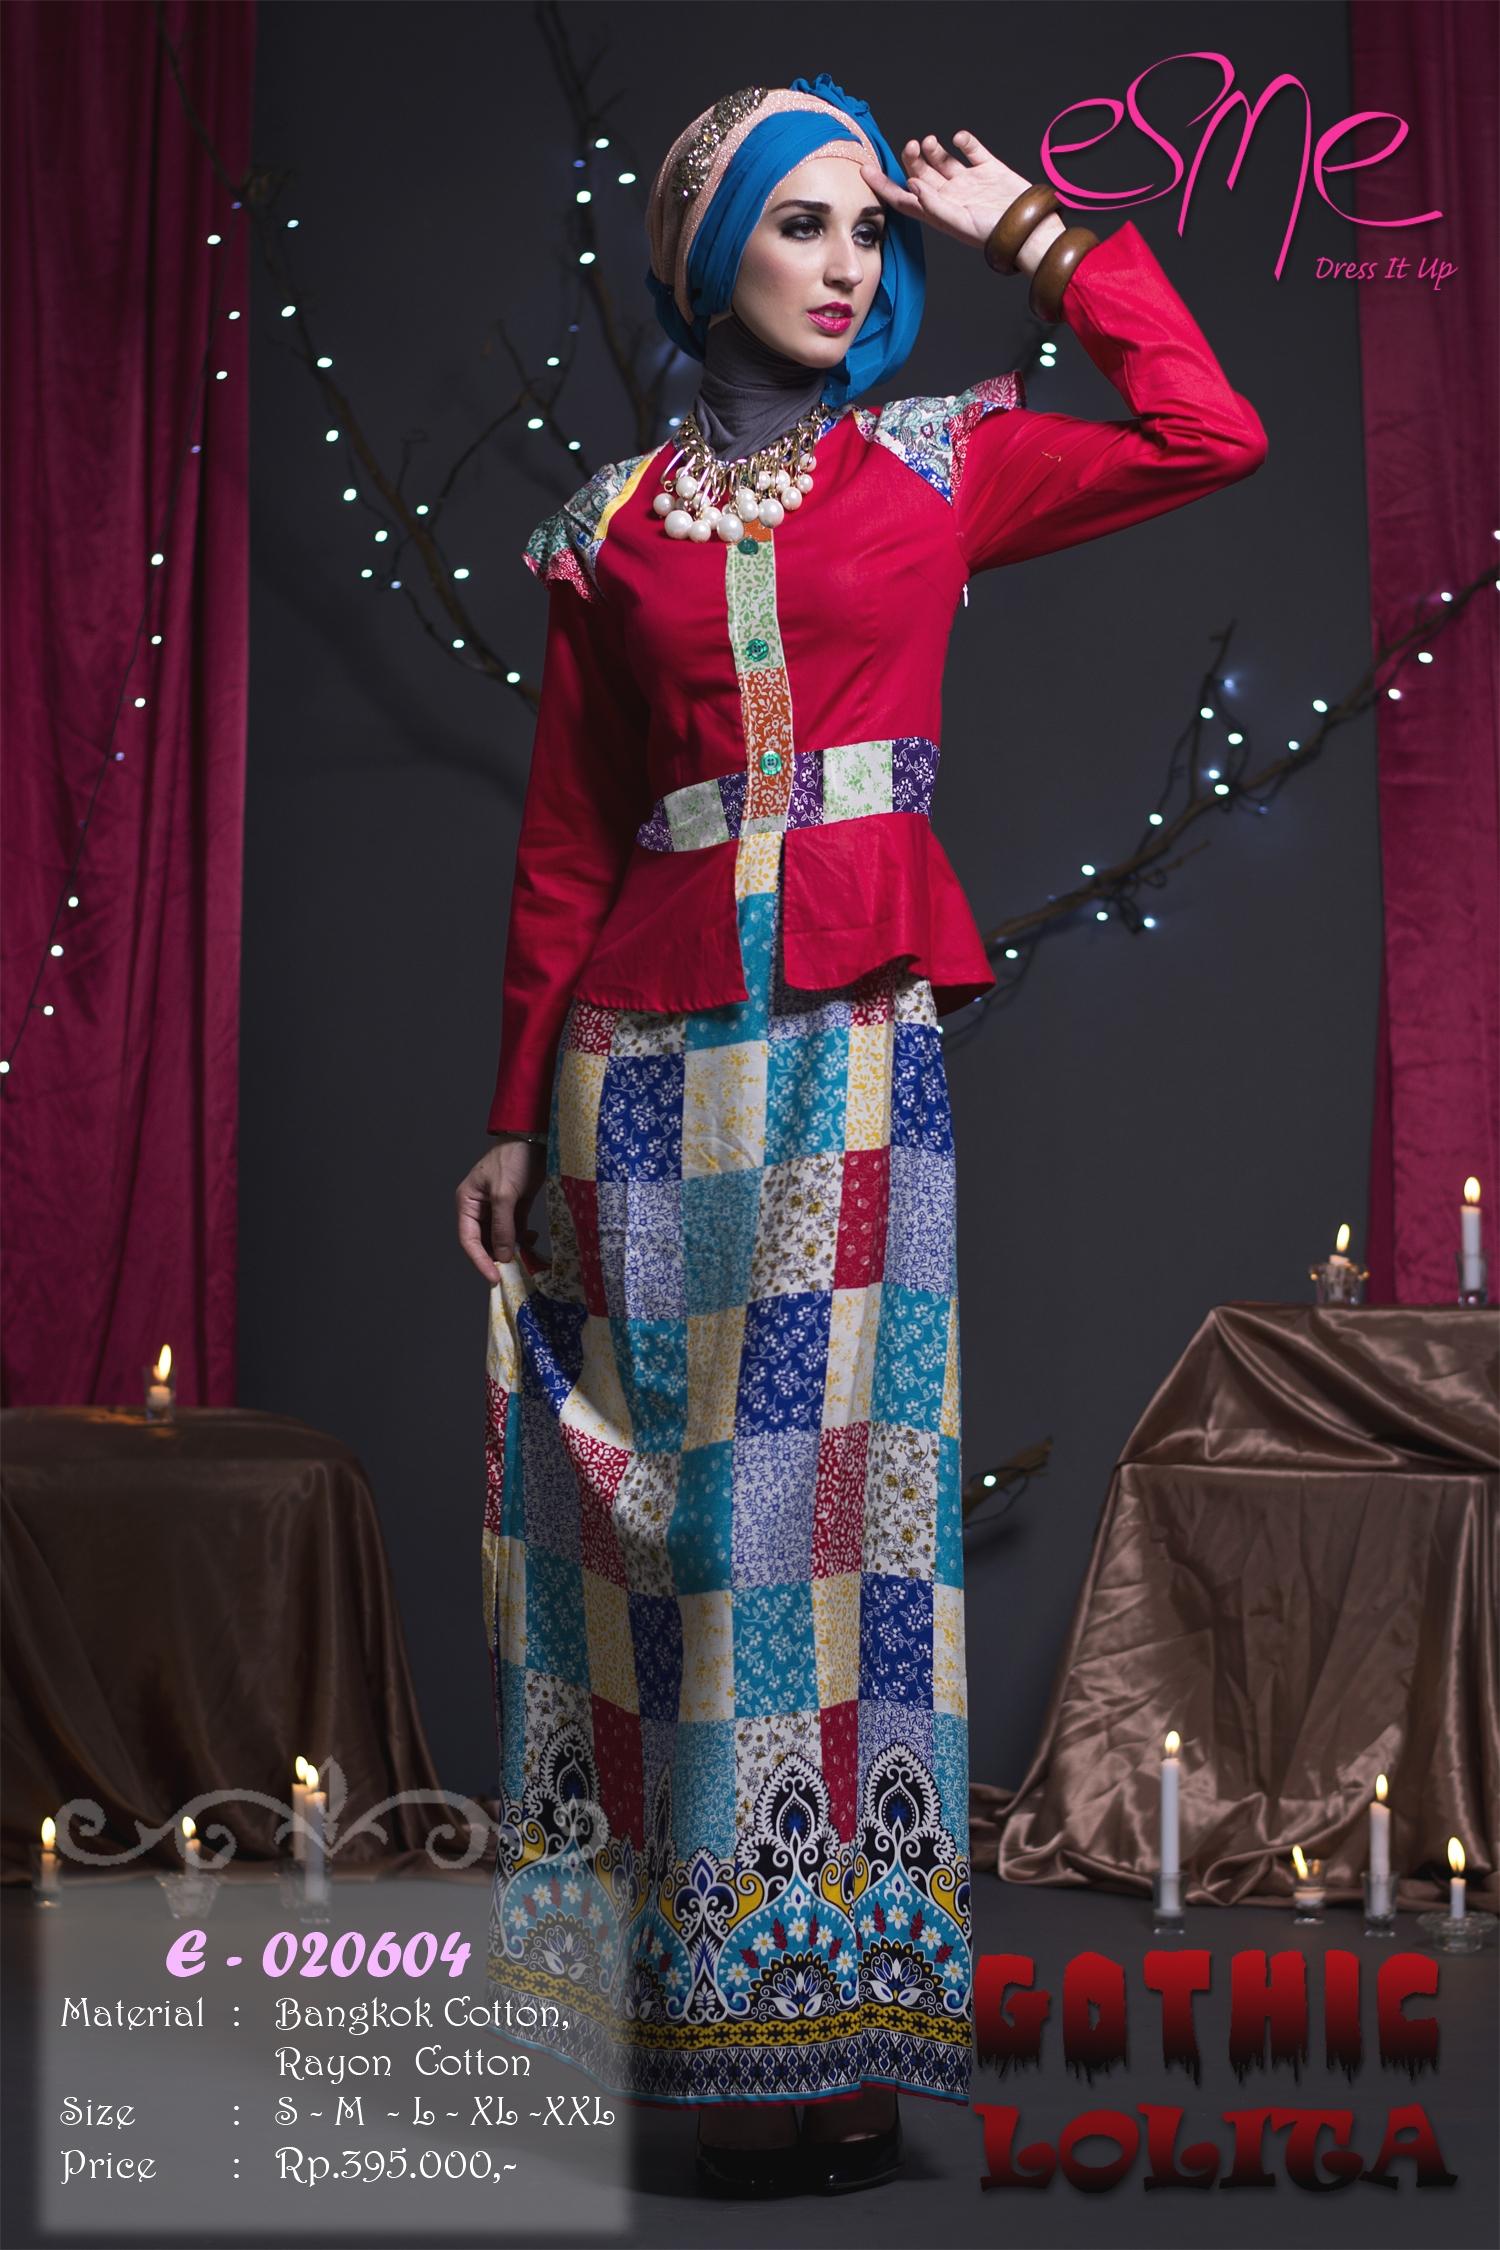 Esme Gothic Lolita E 020604 Baju Muslim Gamis Modern